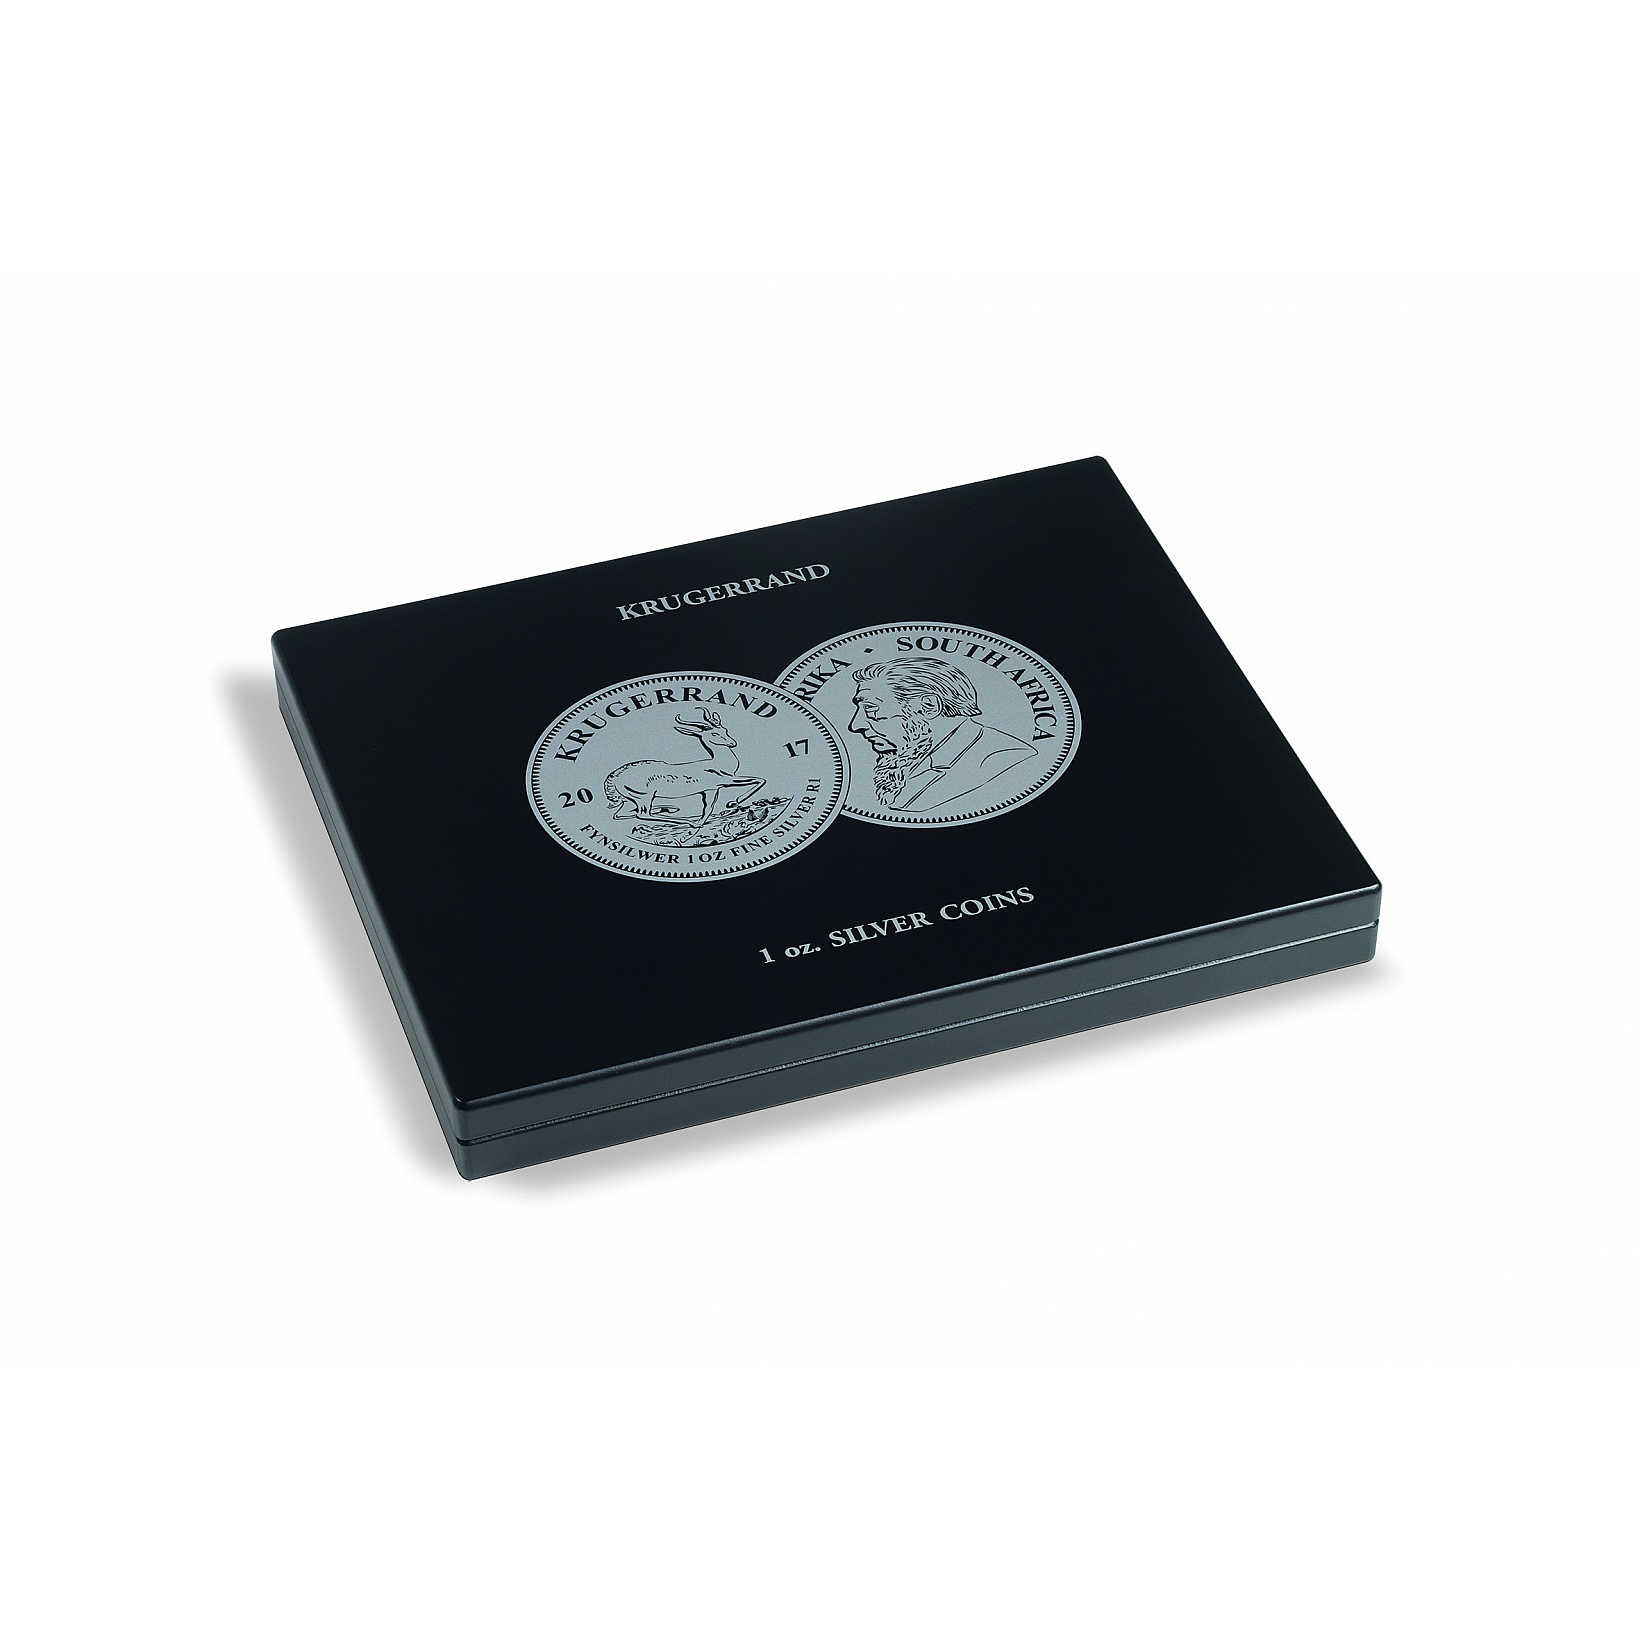 presentation-case-for-20-krugerrand-silver-coins-1-oz-in-capsules